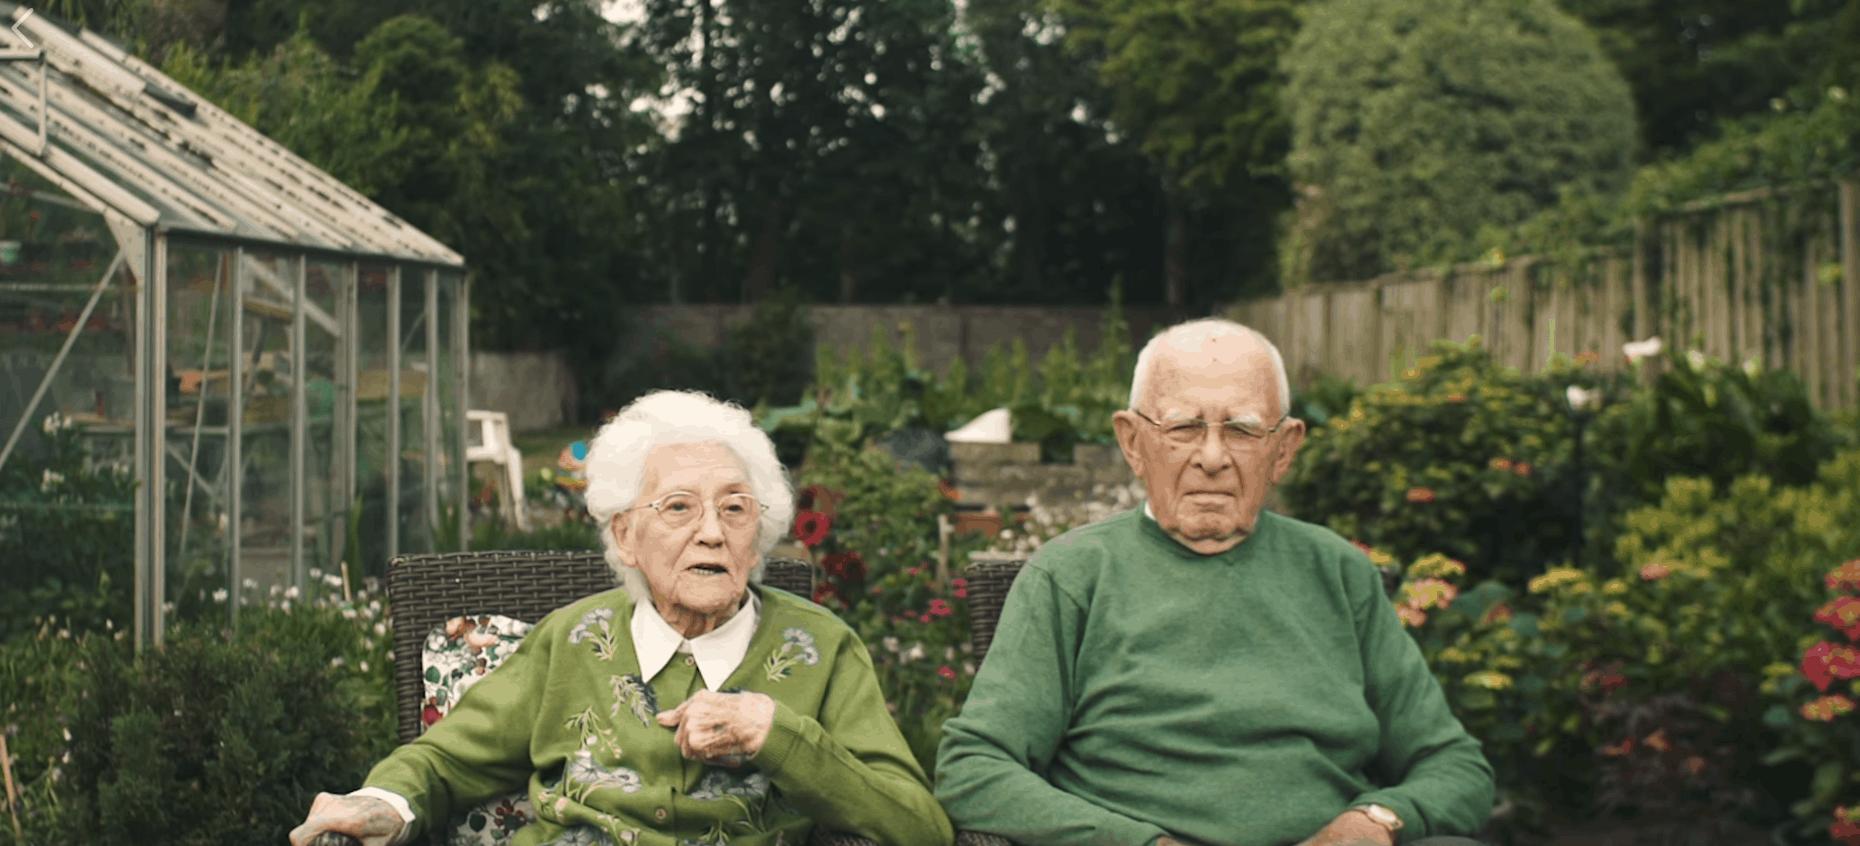 Irish couple 101 and 95 years old